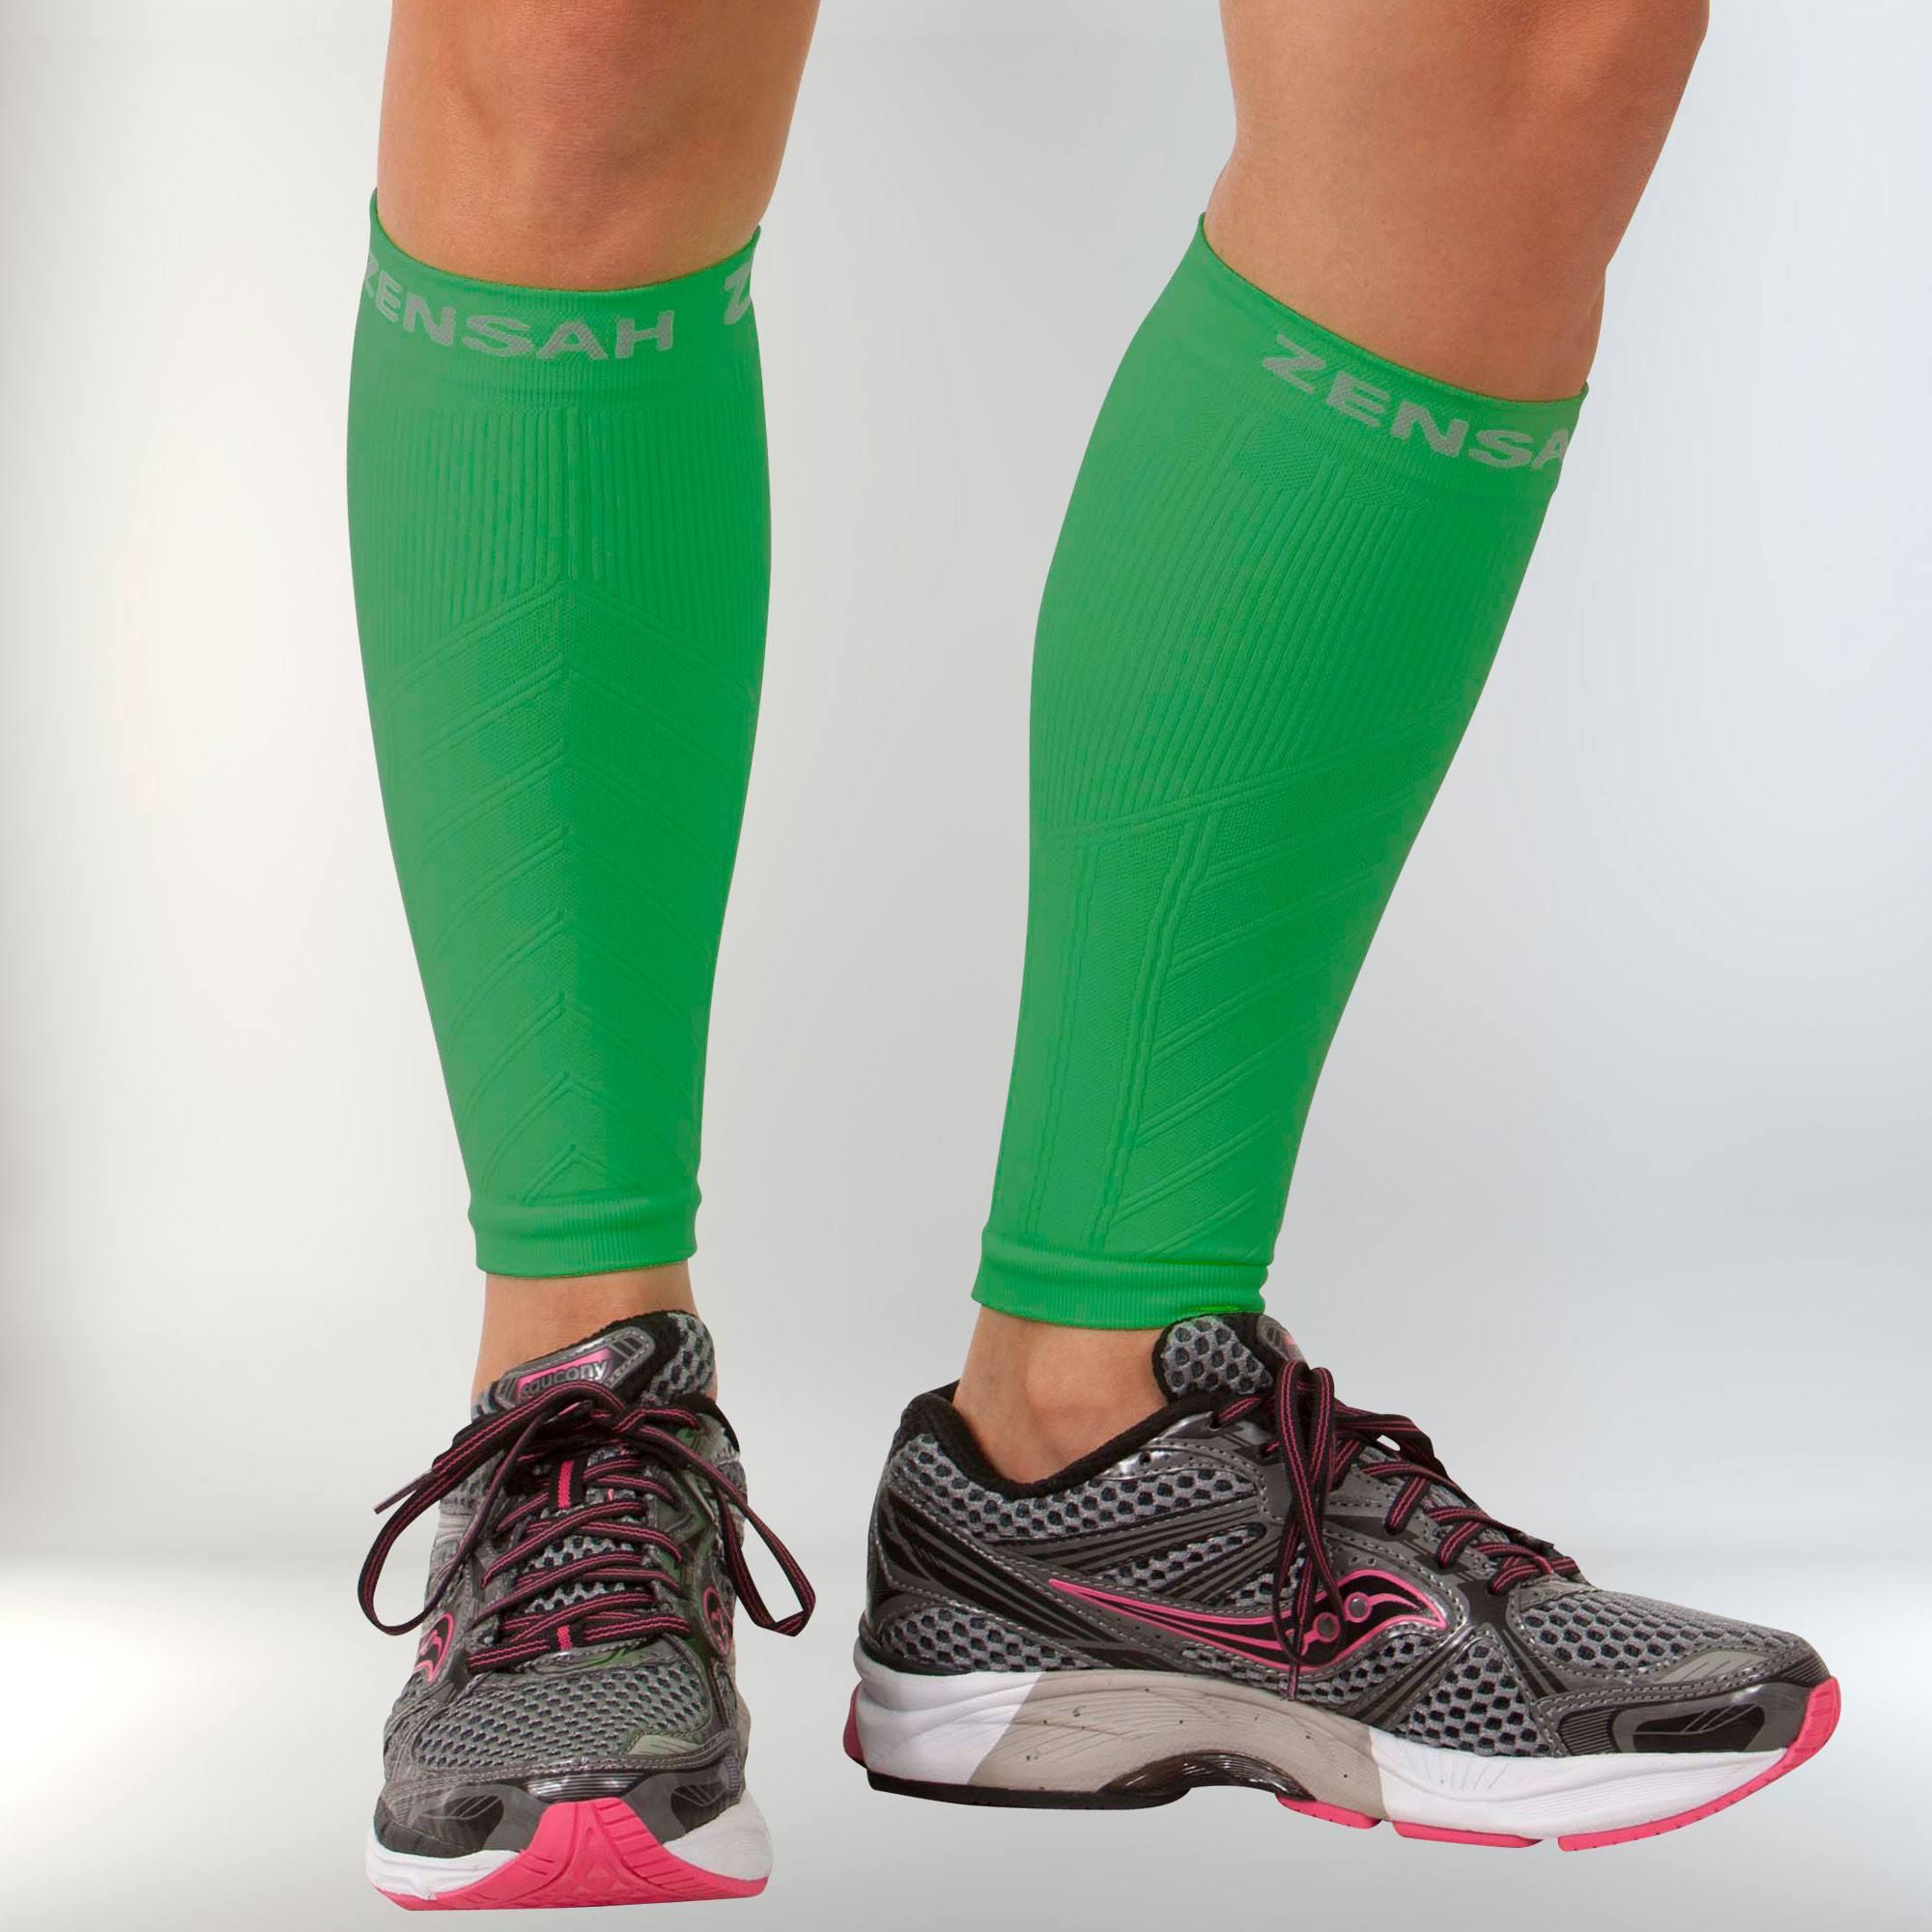 Zensah Compression Leg Sleeves  Pair